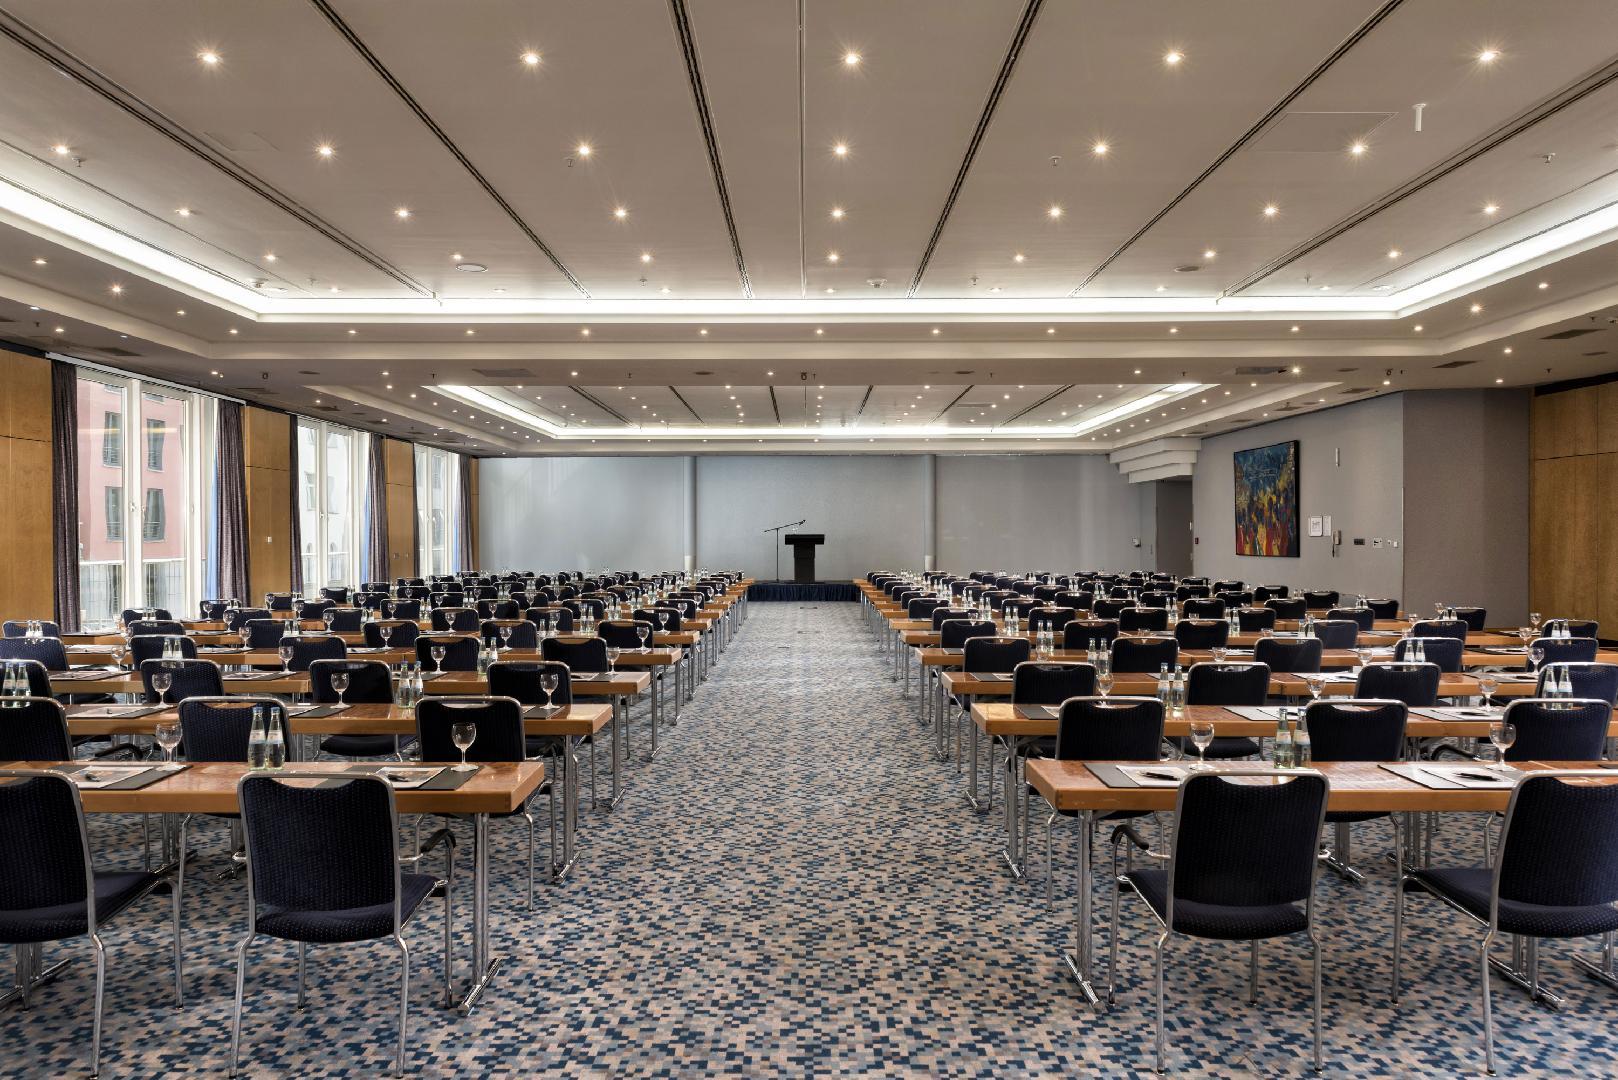 Bild 1 von Saal II im Maritim proArte Hotel Berlin